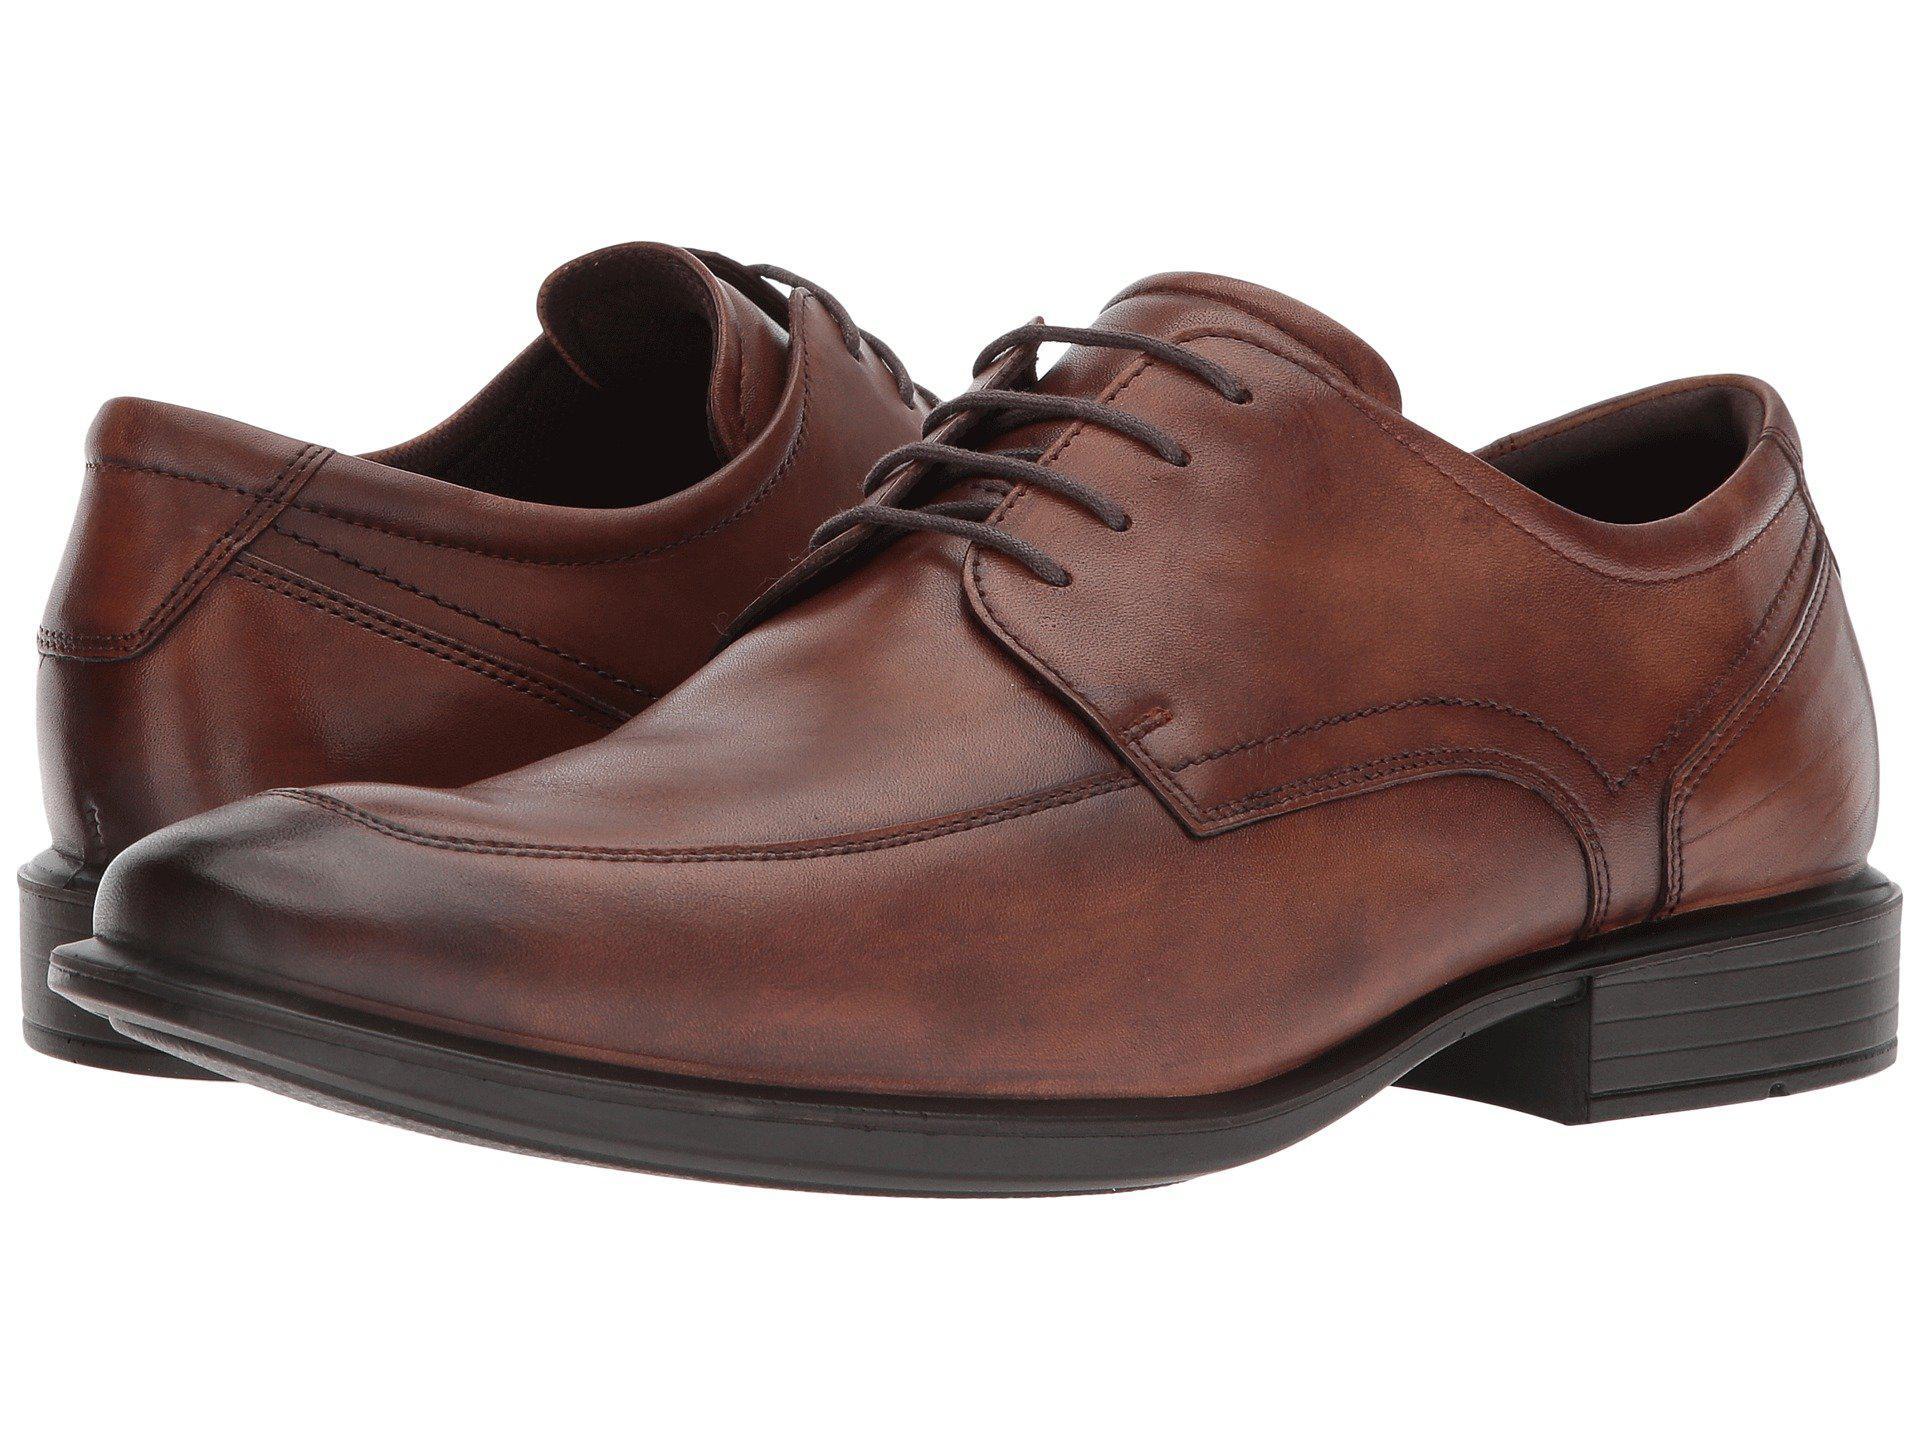 f86ad86f4a3 Lyst - Ecco Cairo Formal Tie in Brown for Men